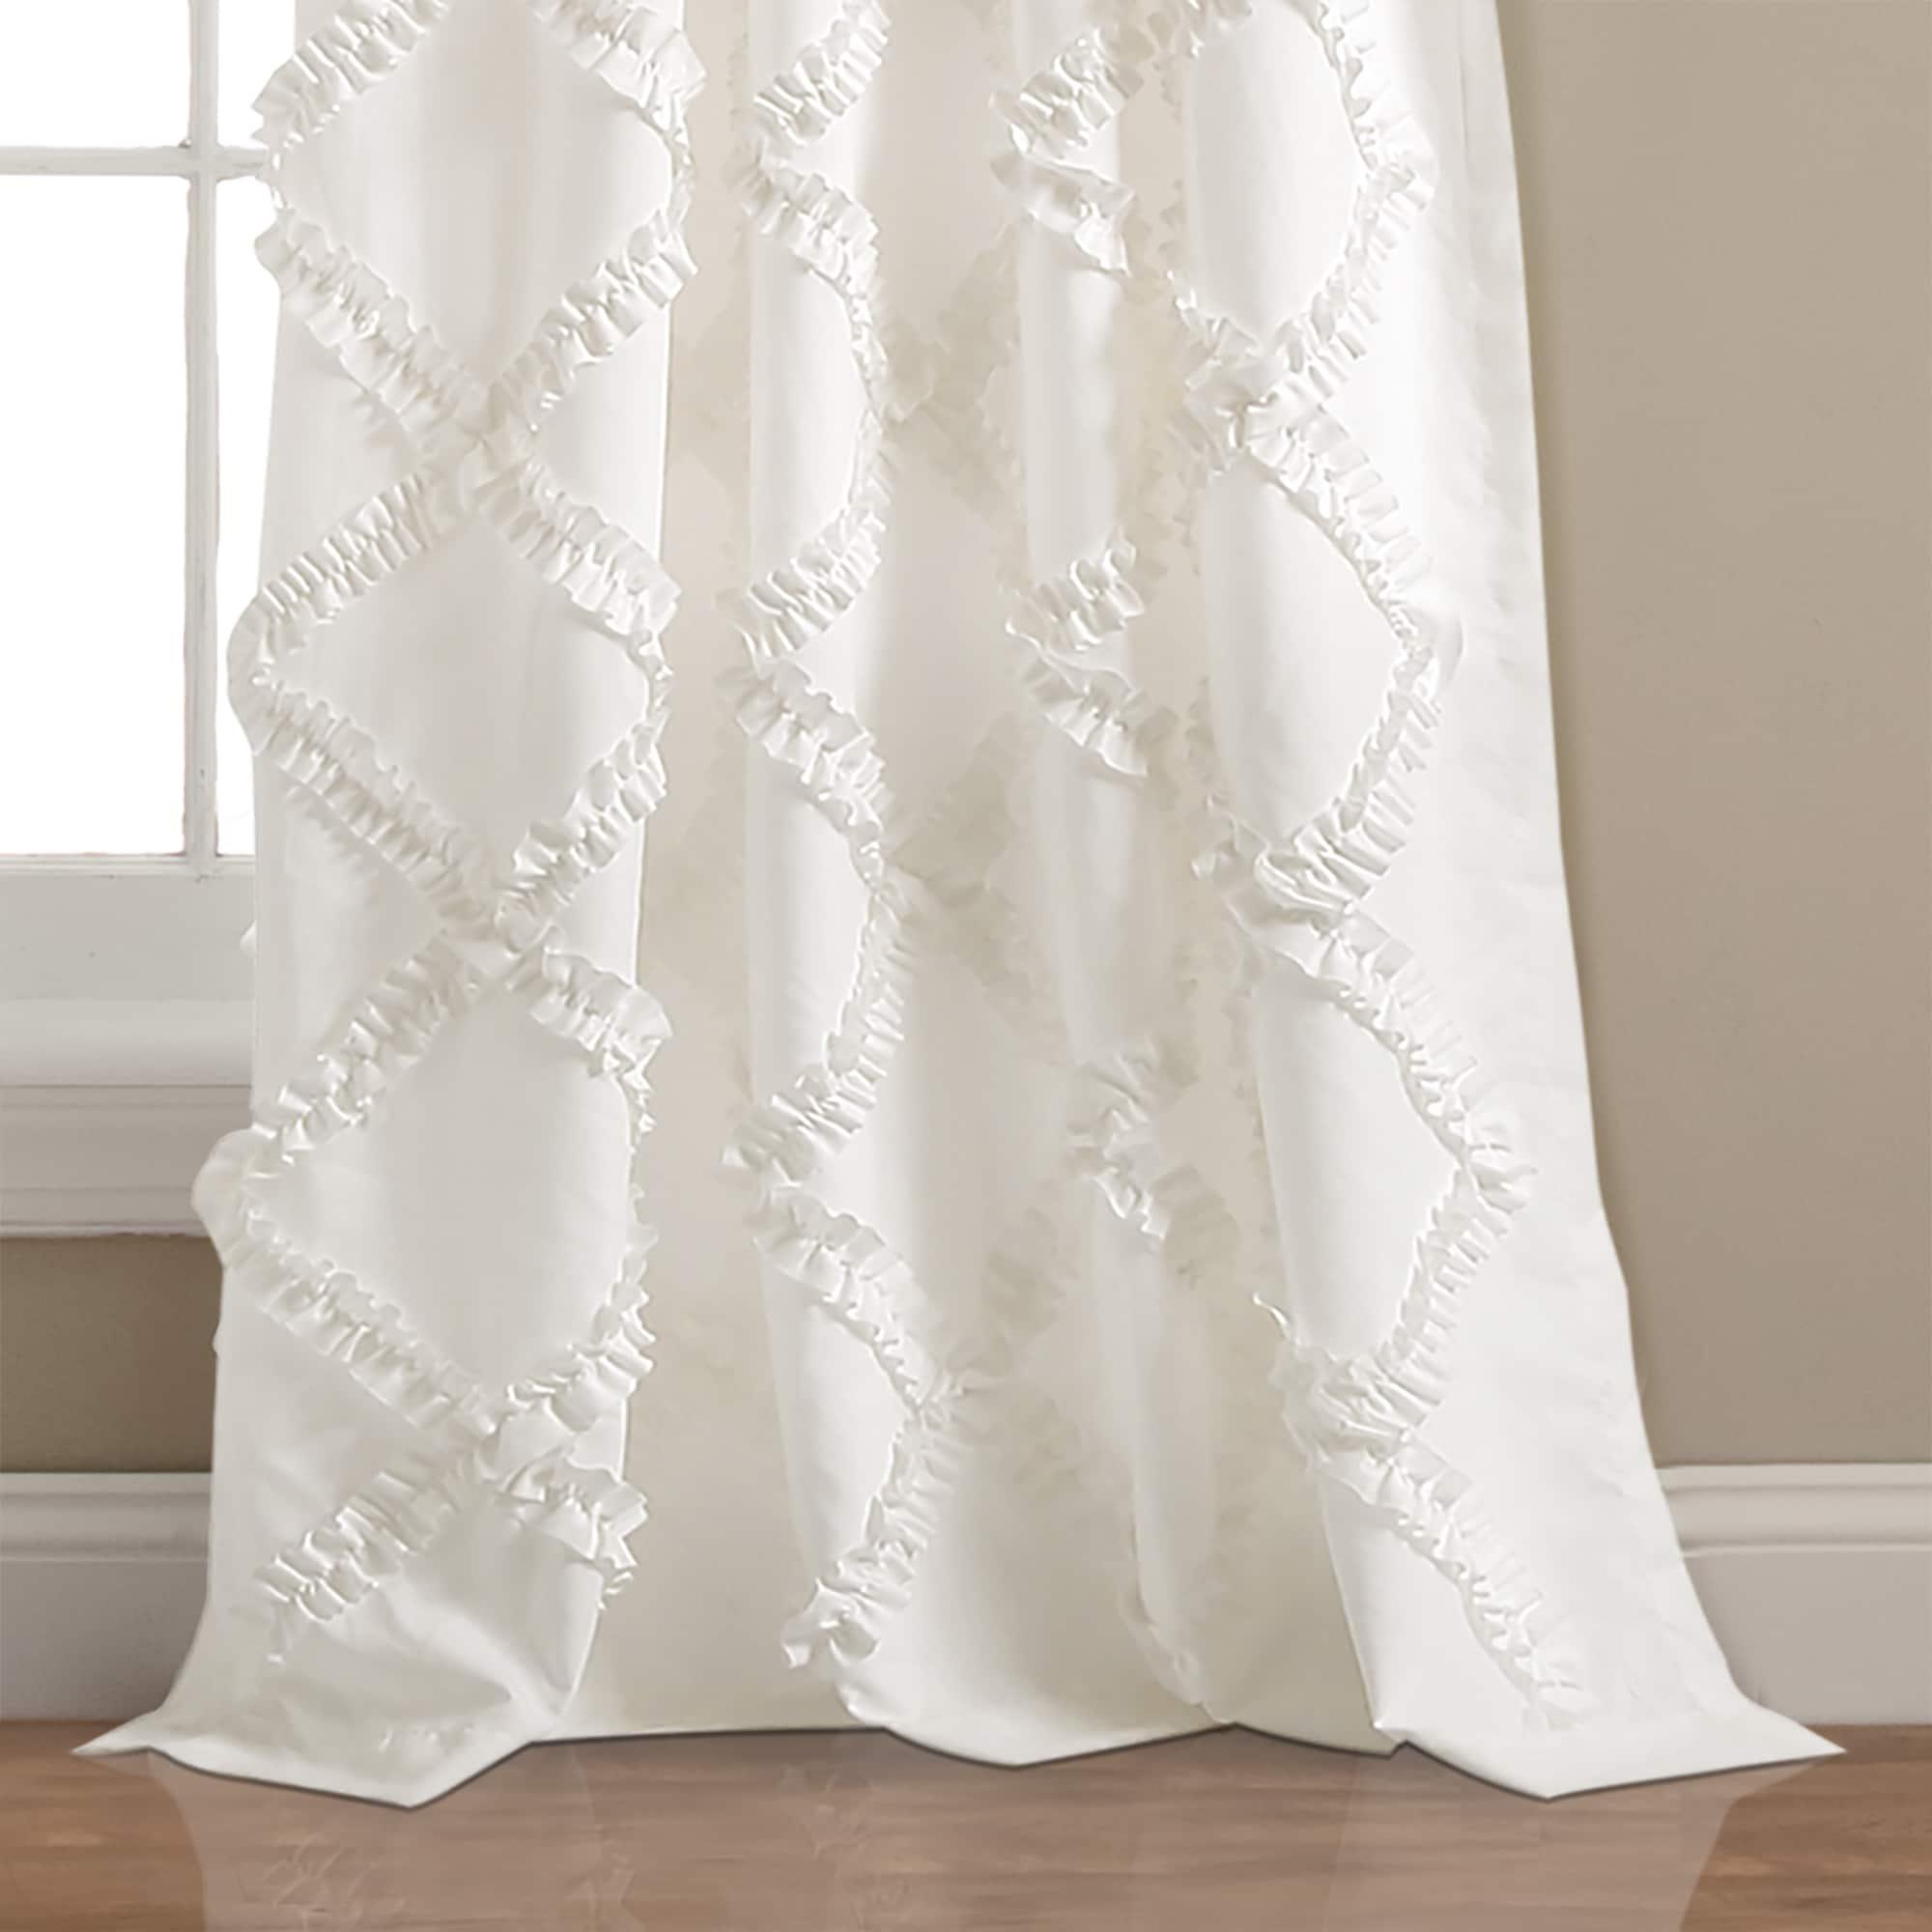 Shop Lush Decor Ruffle Diamond Curtain Panel Pair